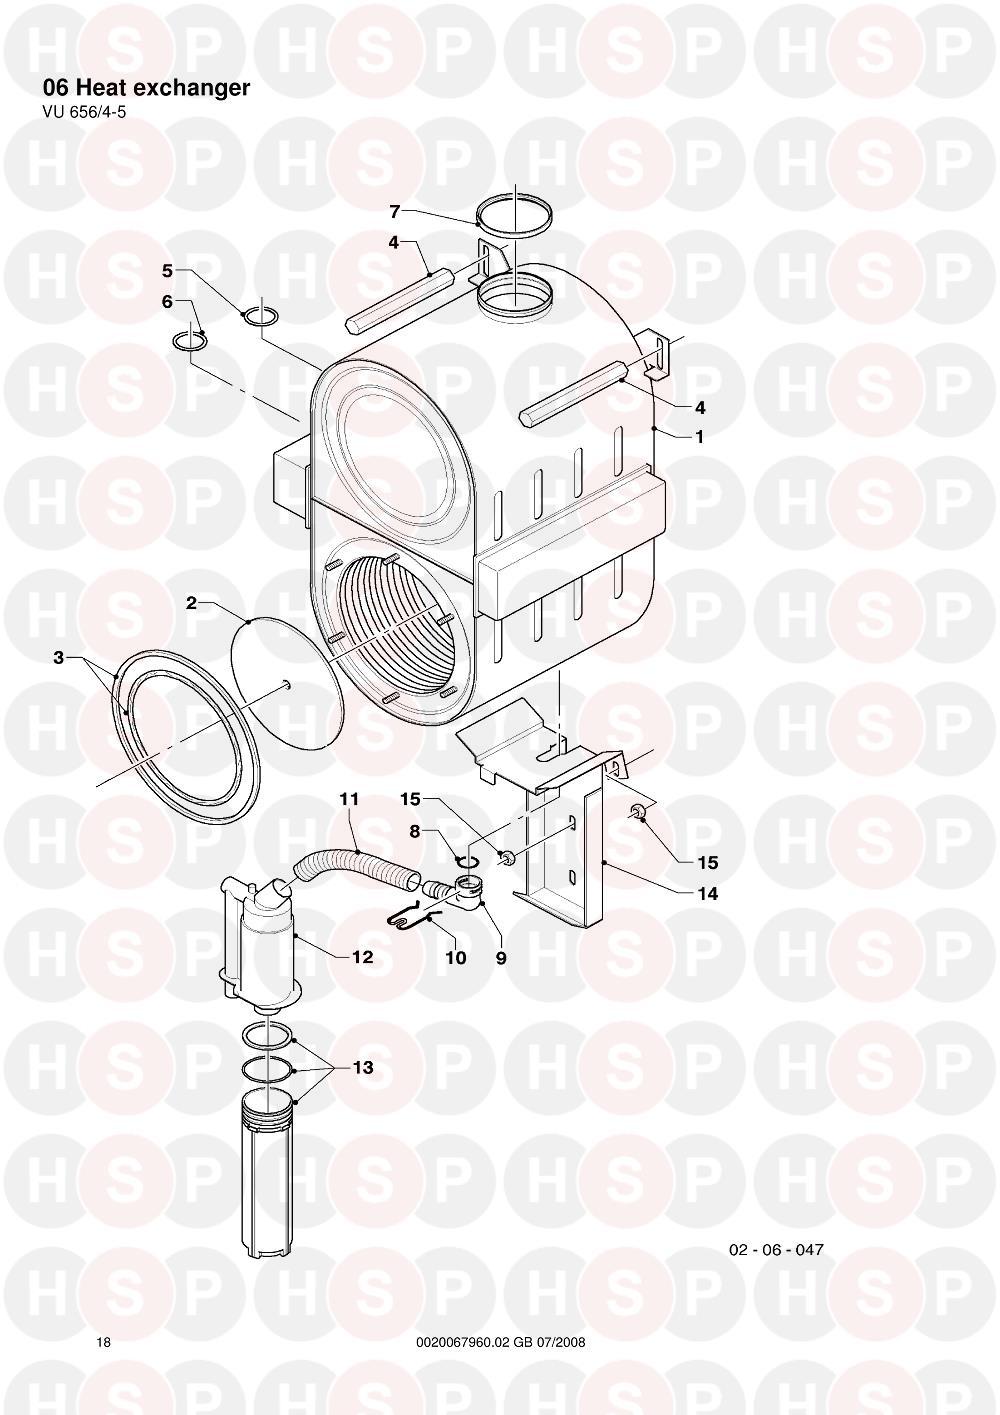 Vaillant ecoTEC VU 656/4-5 (06 Heat exchanger) Diagram